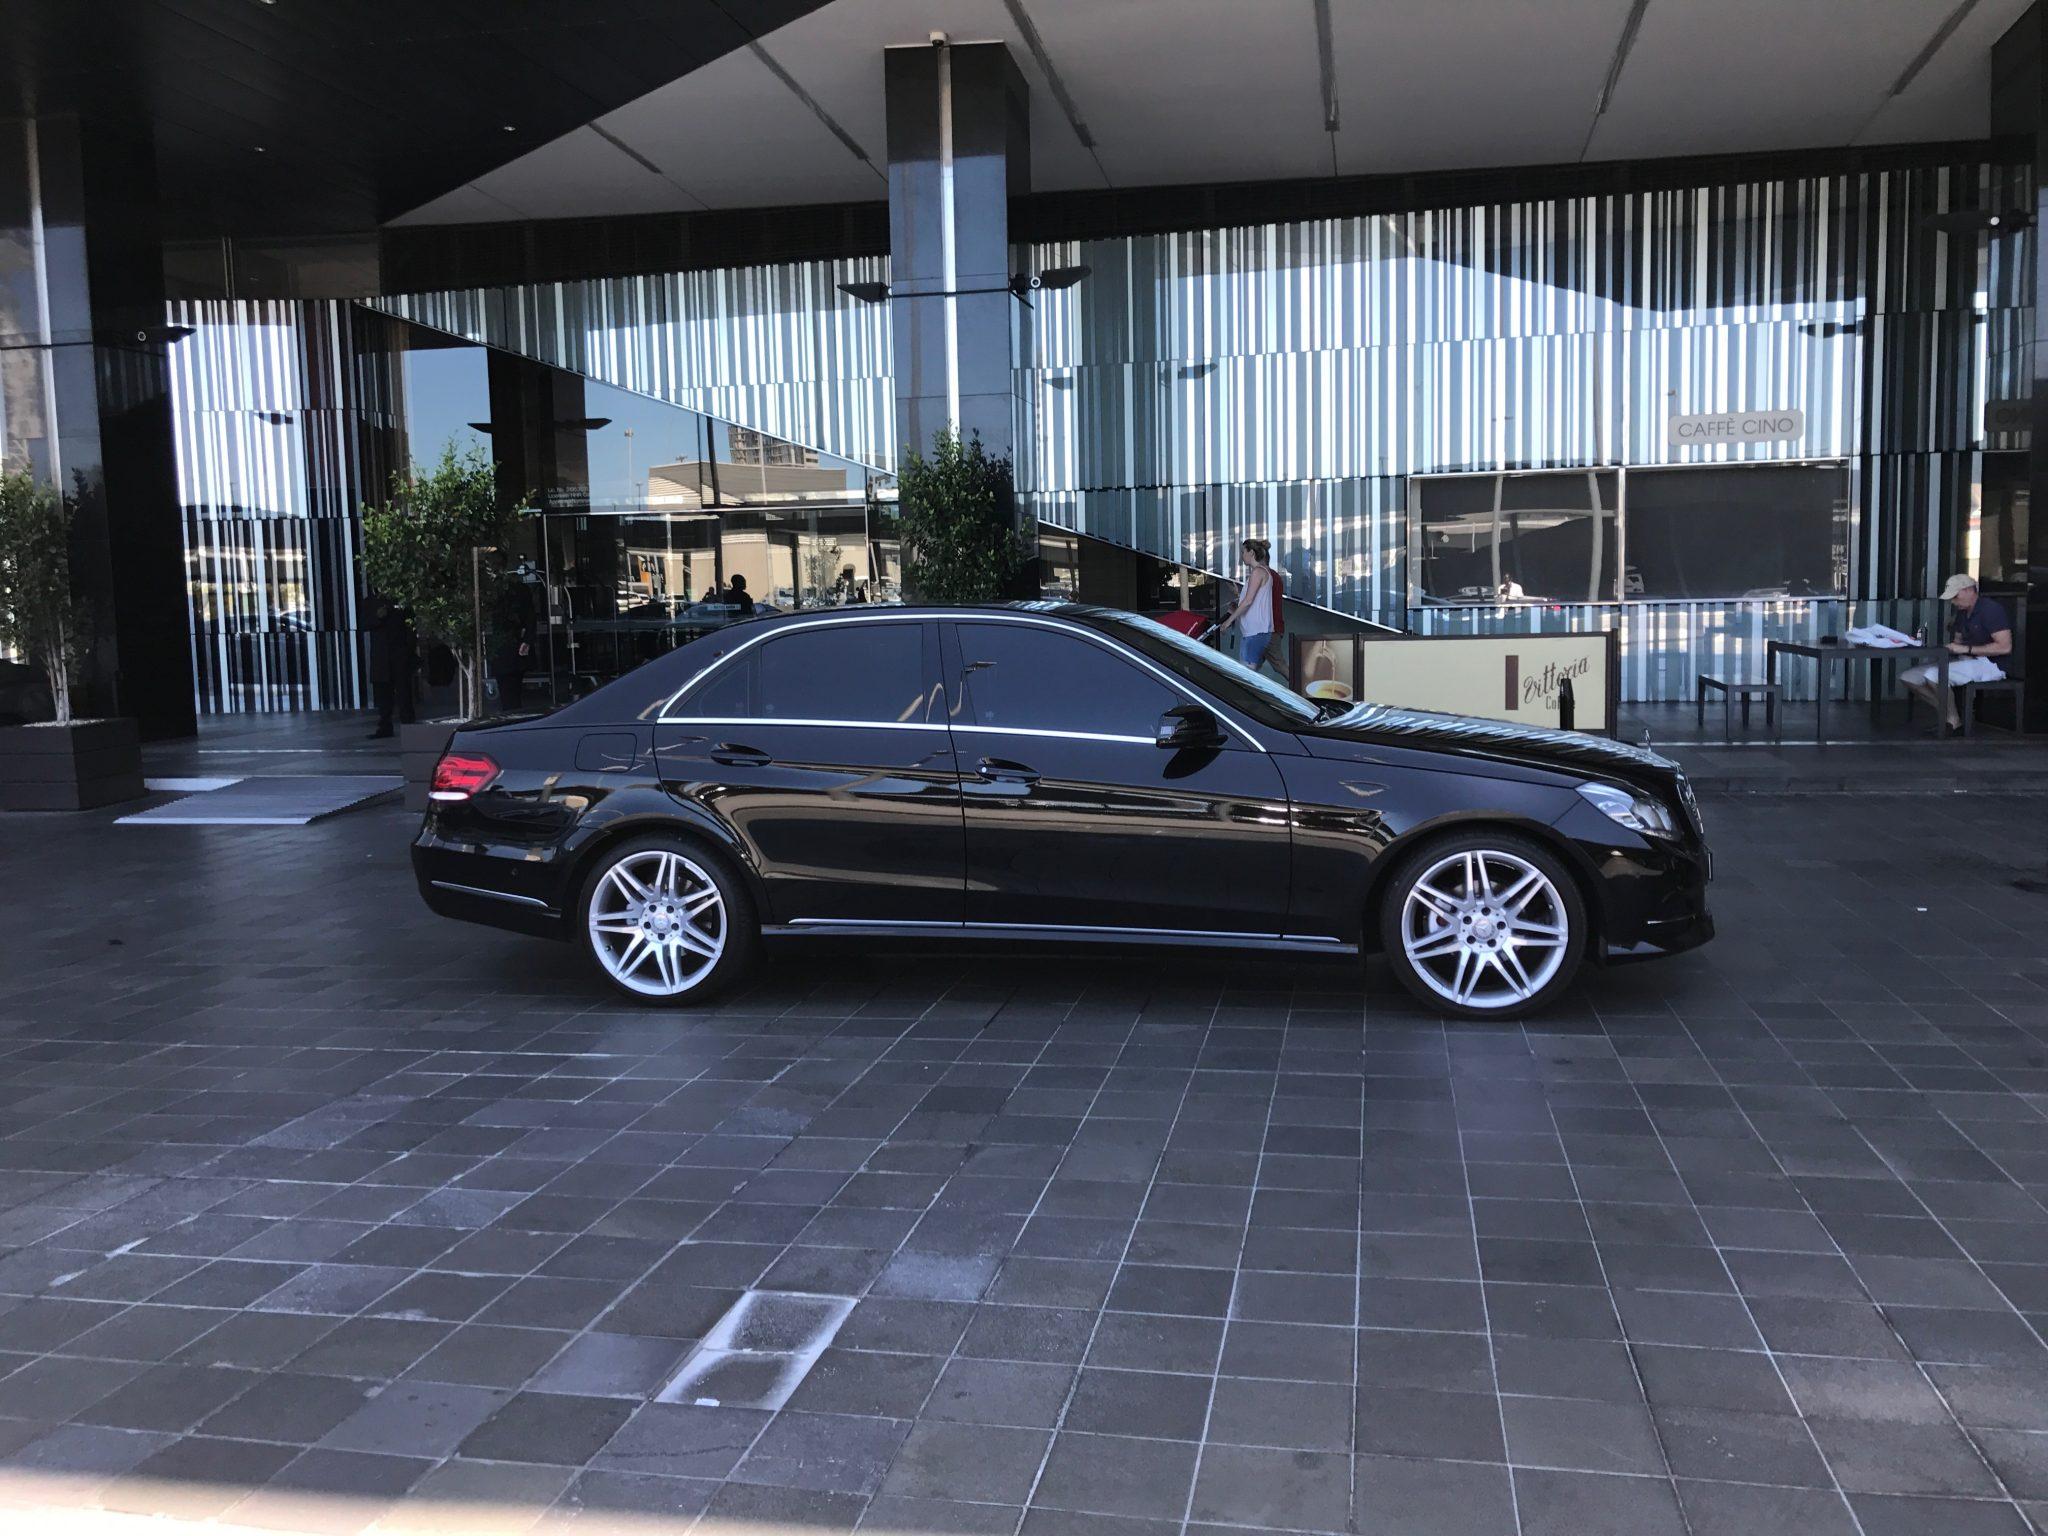 Luxury Car Hire Melbourne Victoria